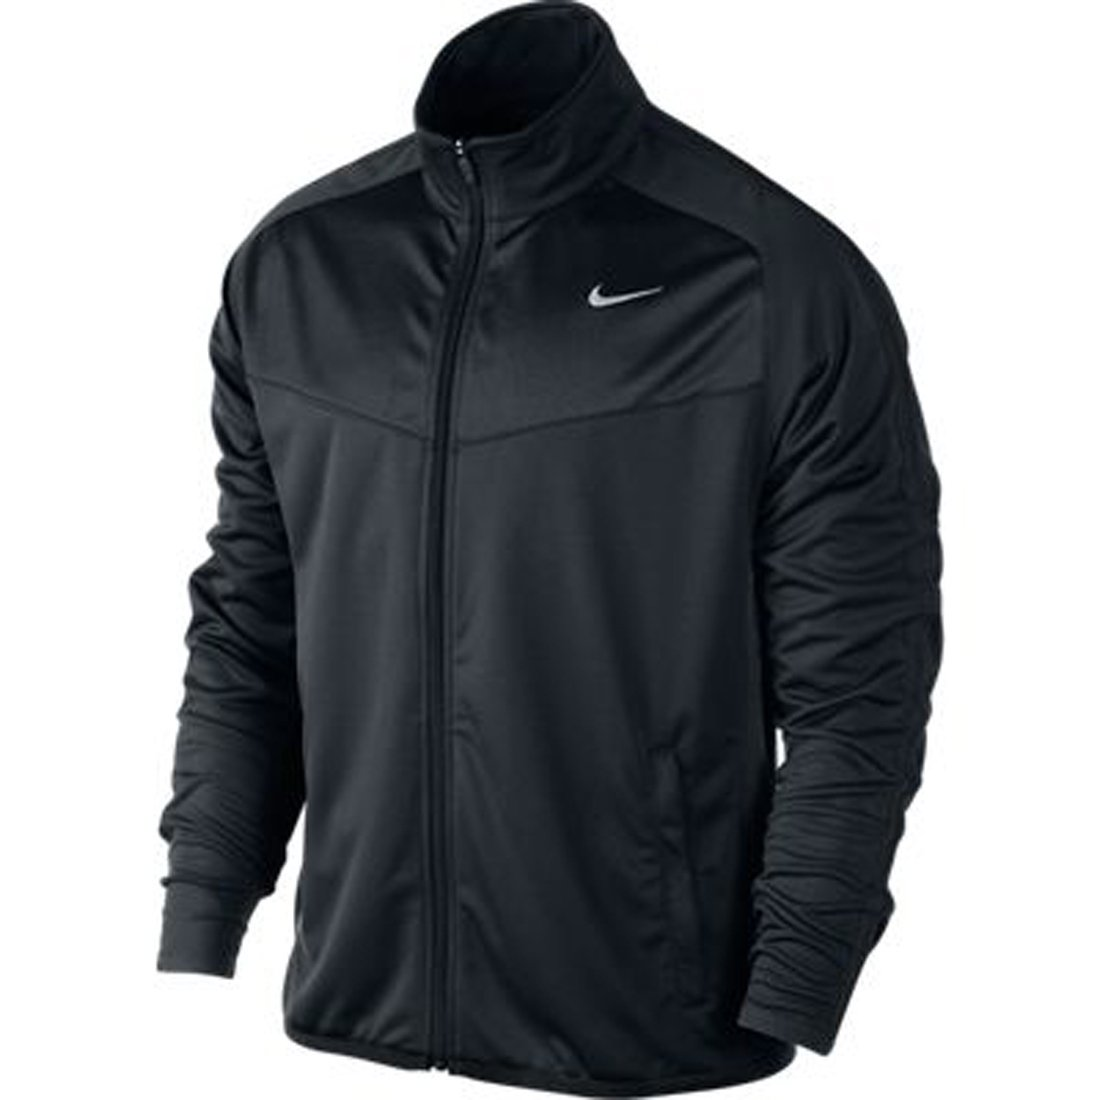 Nike Mens Epic Training Jacket, Black/Cool Grey, Medium 519534